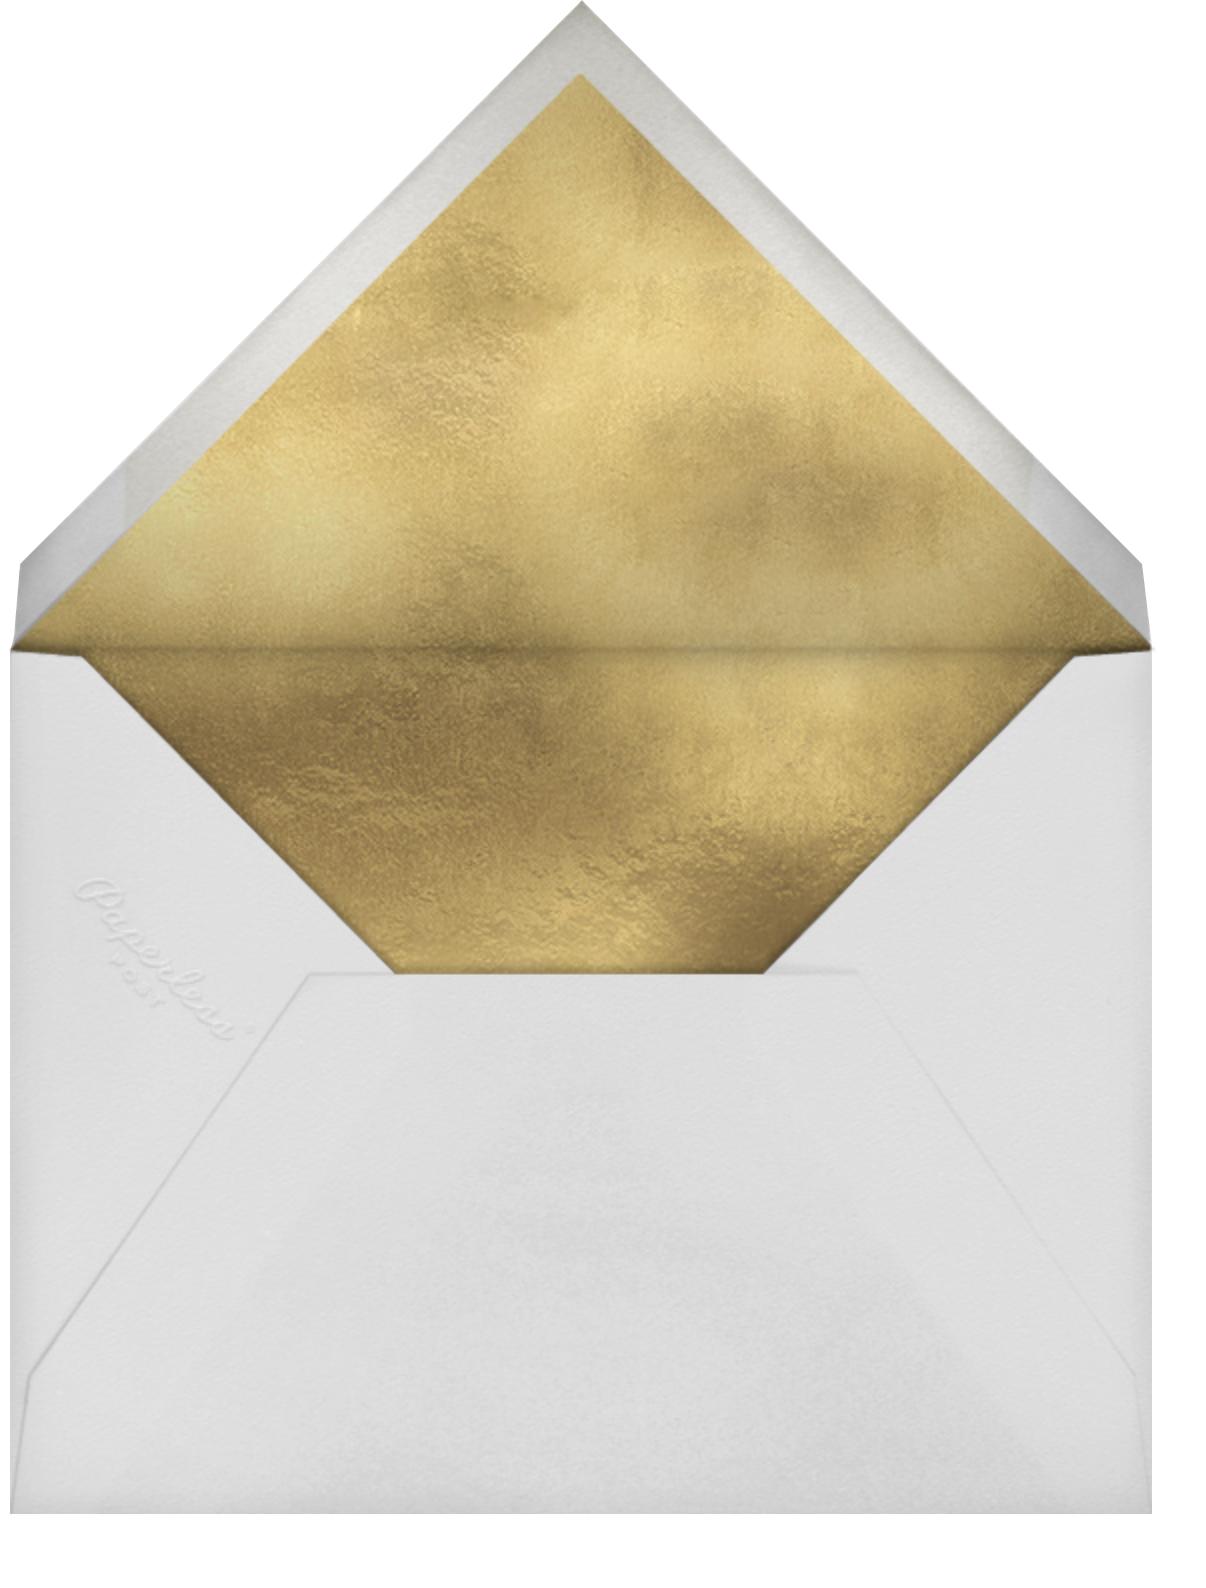 Confetti Caps - Gold - Paperless Post - Graduation party - envelope back